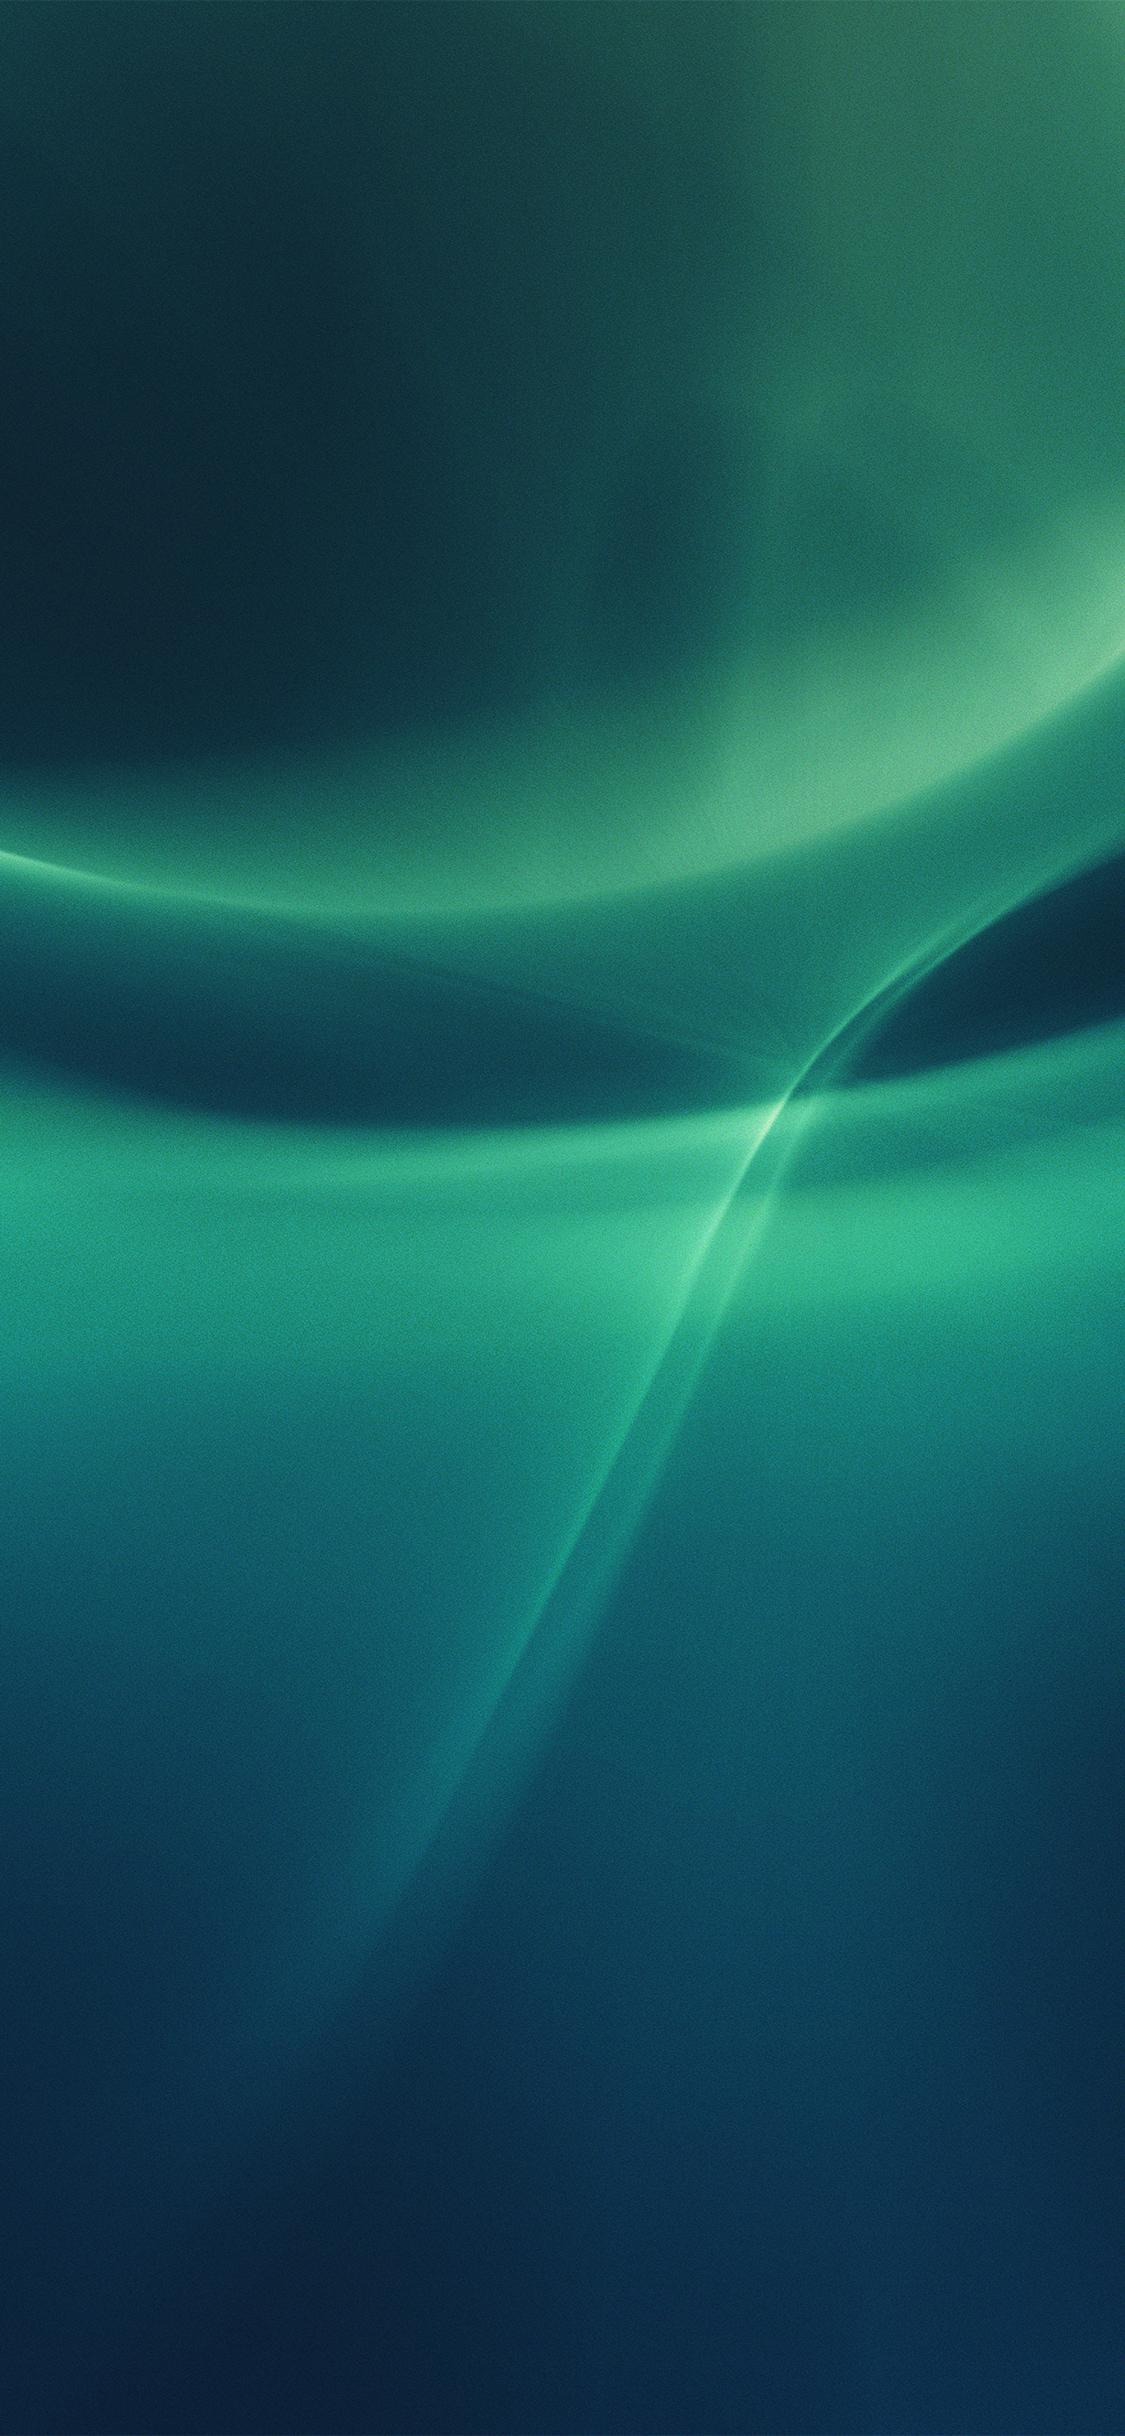 Iphonexpapers Com Iphone X Wallpaper Vg43 Ribbon Abstract Art Green Pattern